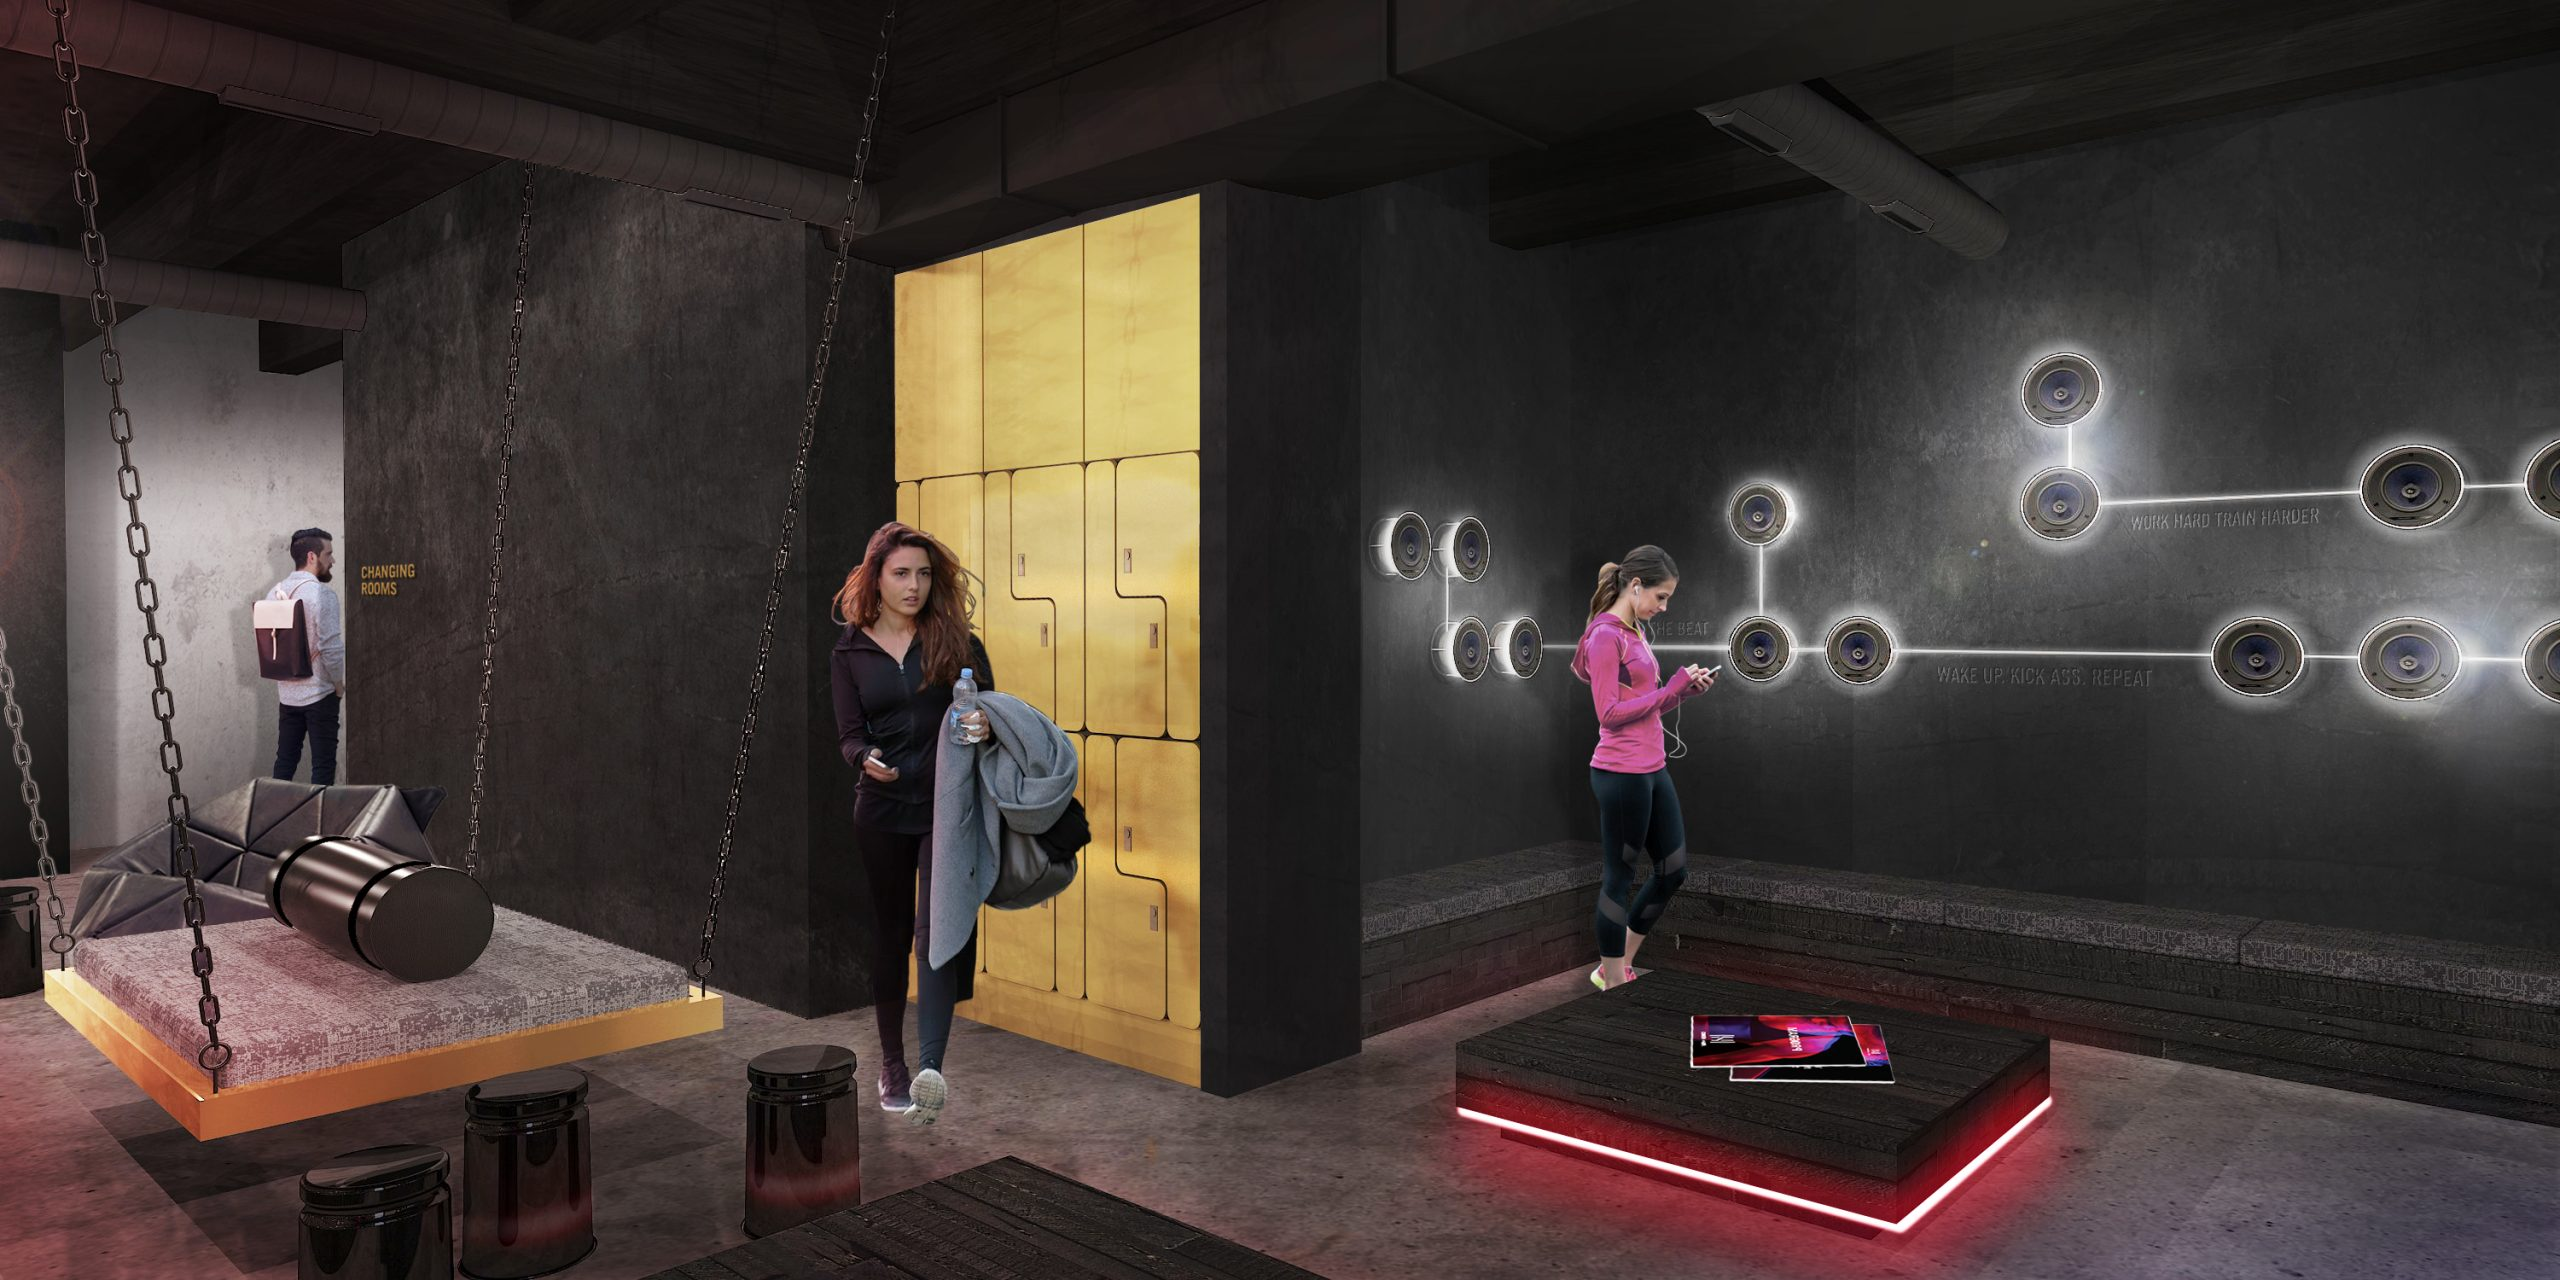 Frauen im Lounge des modernen Fitnessstudios Urban Heroes